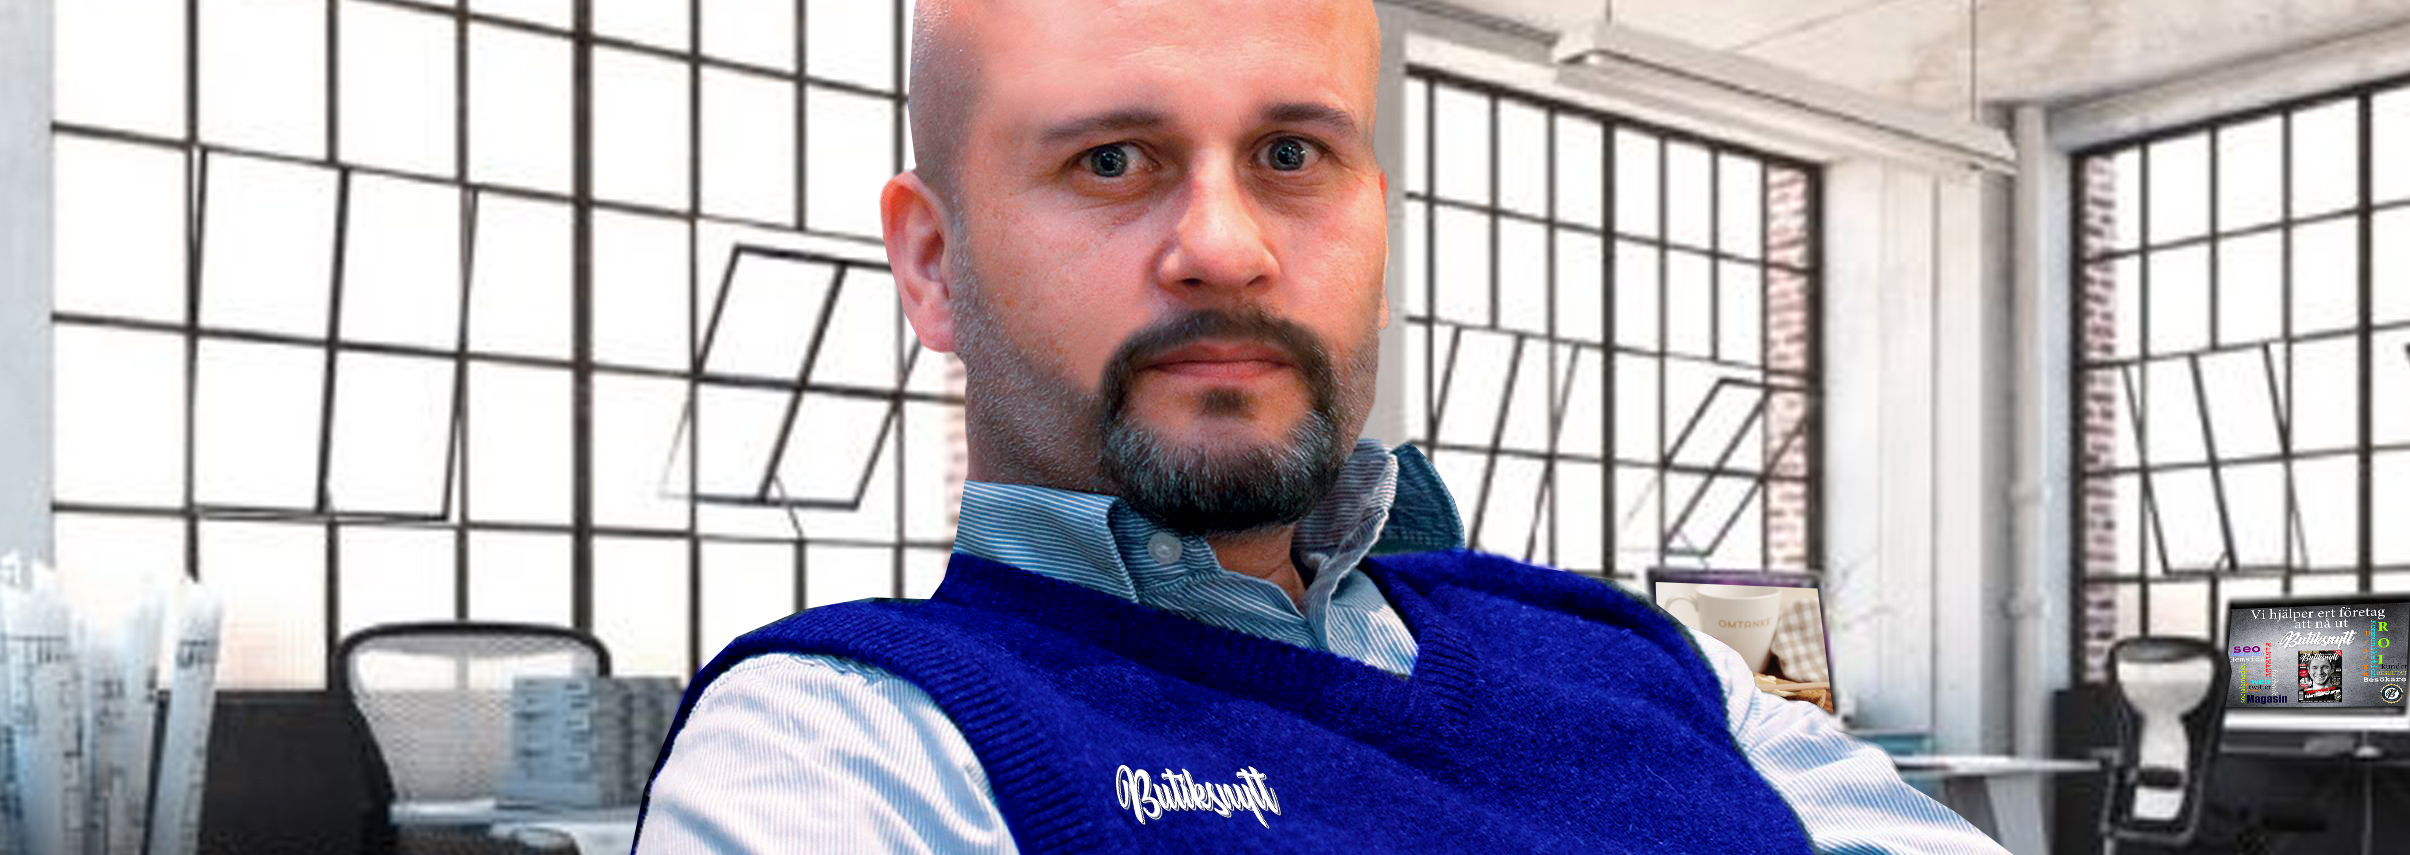 Jonny Bothin Publisher